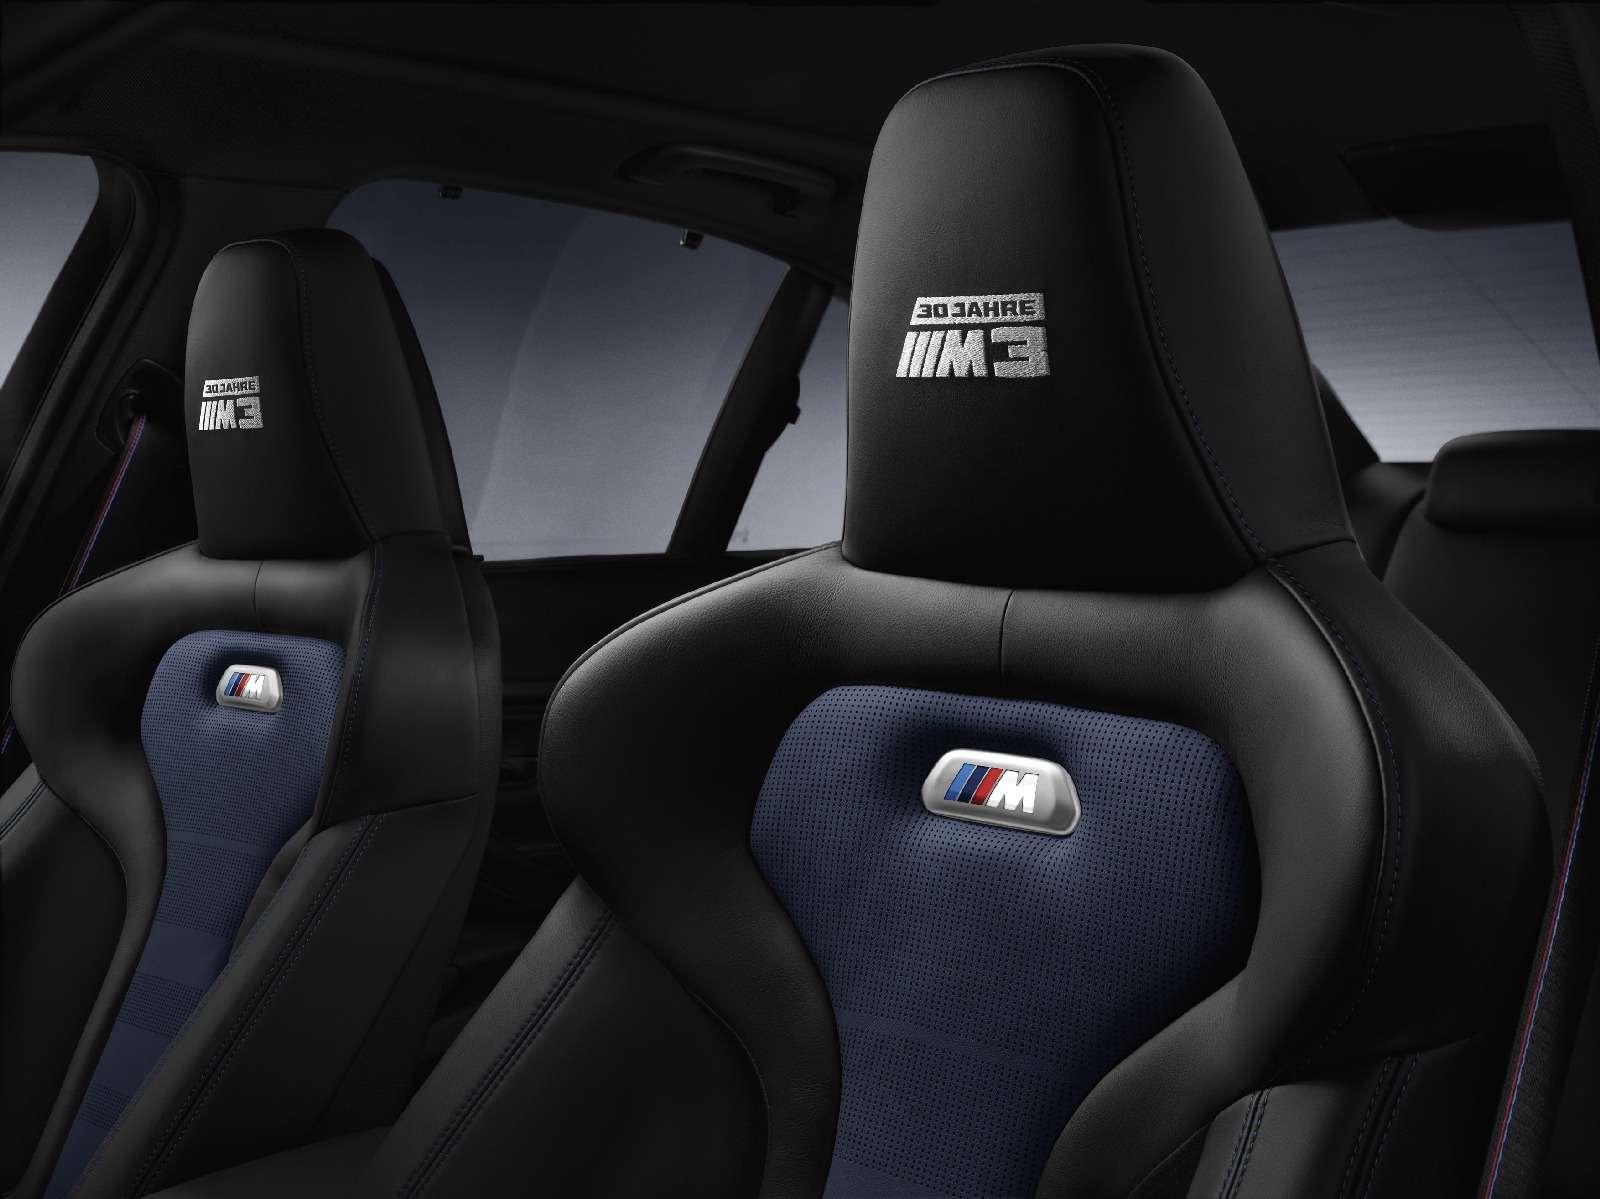 BMWM3отпразднует 30-летний юбилей с«лишними» дверьми— фото 593124